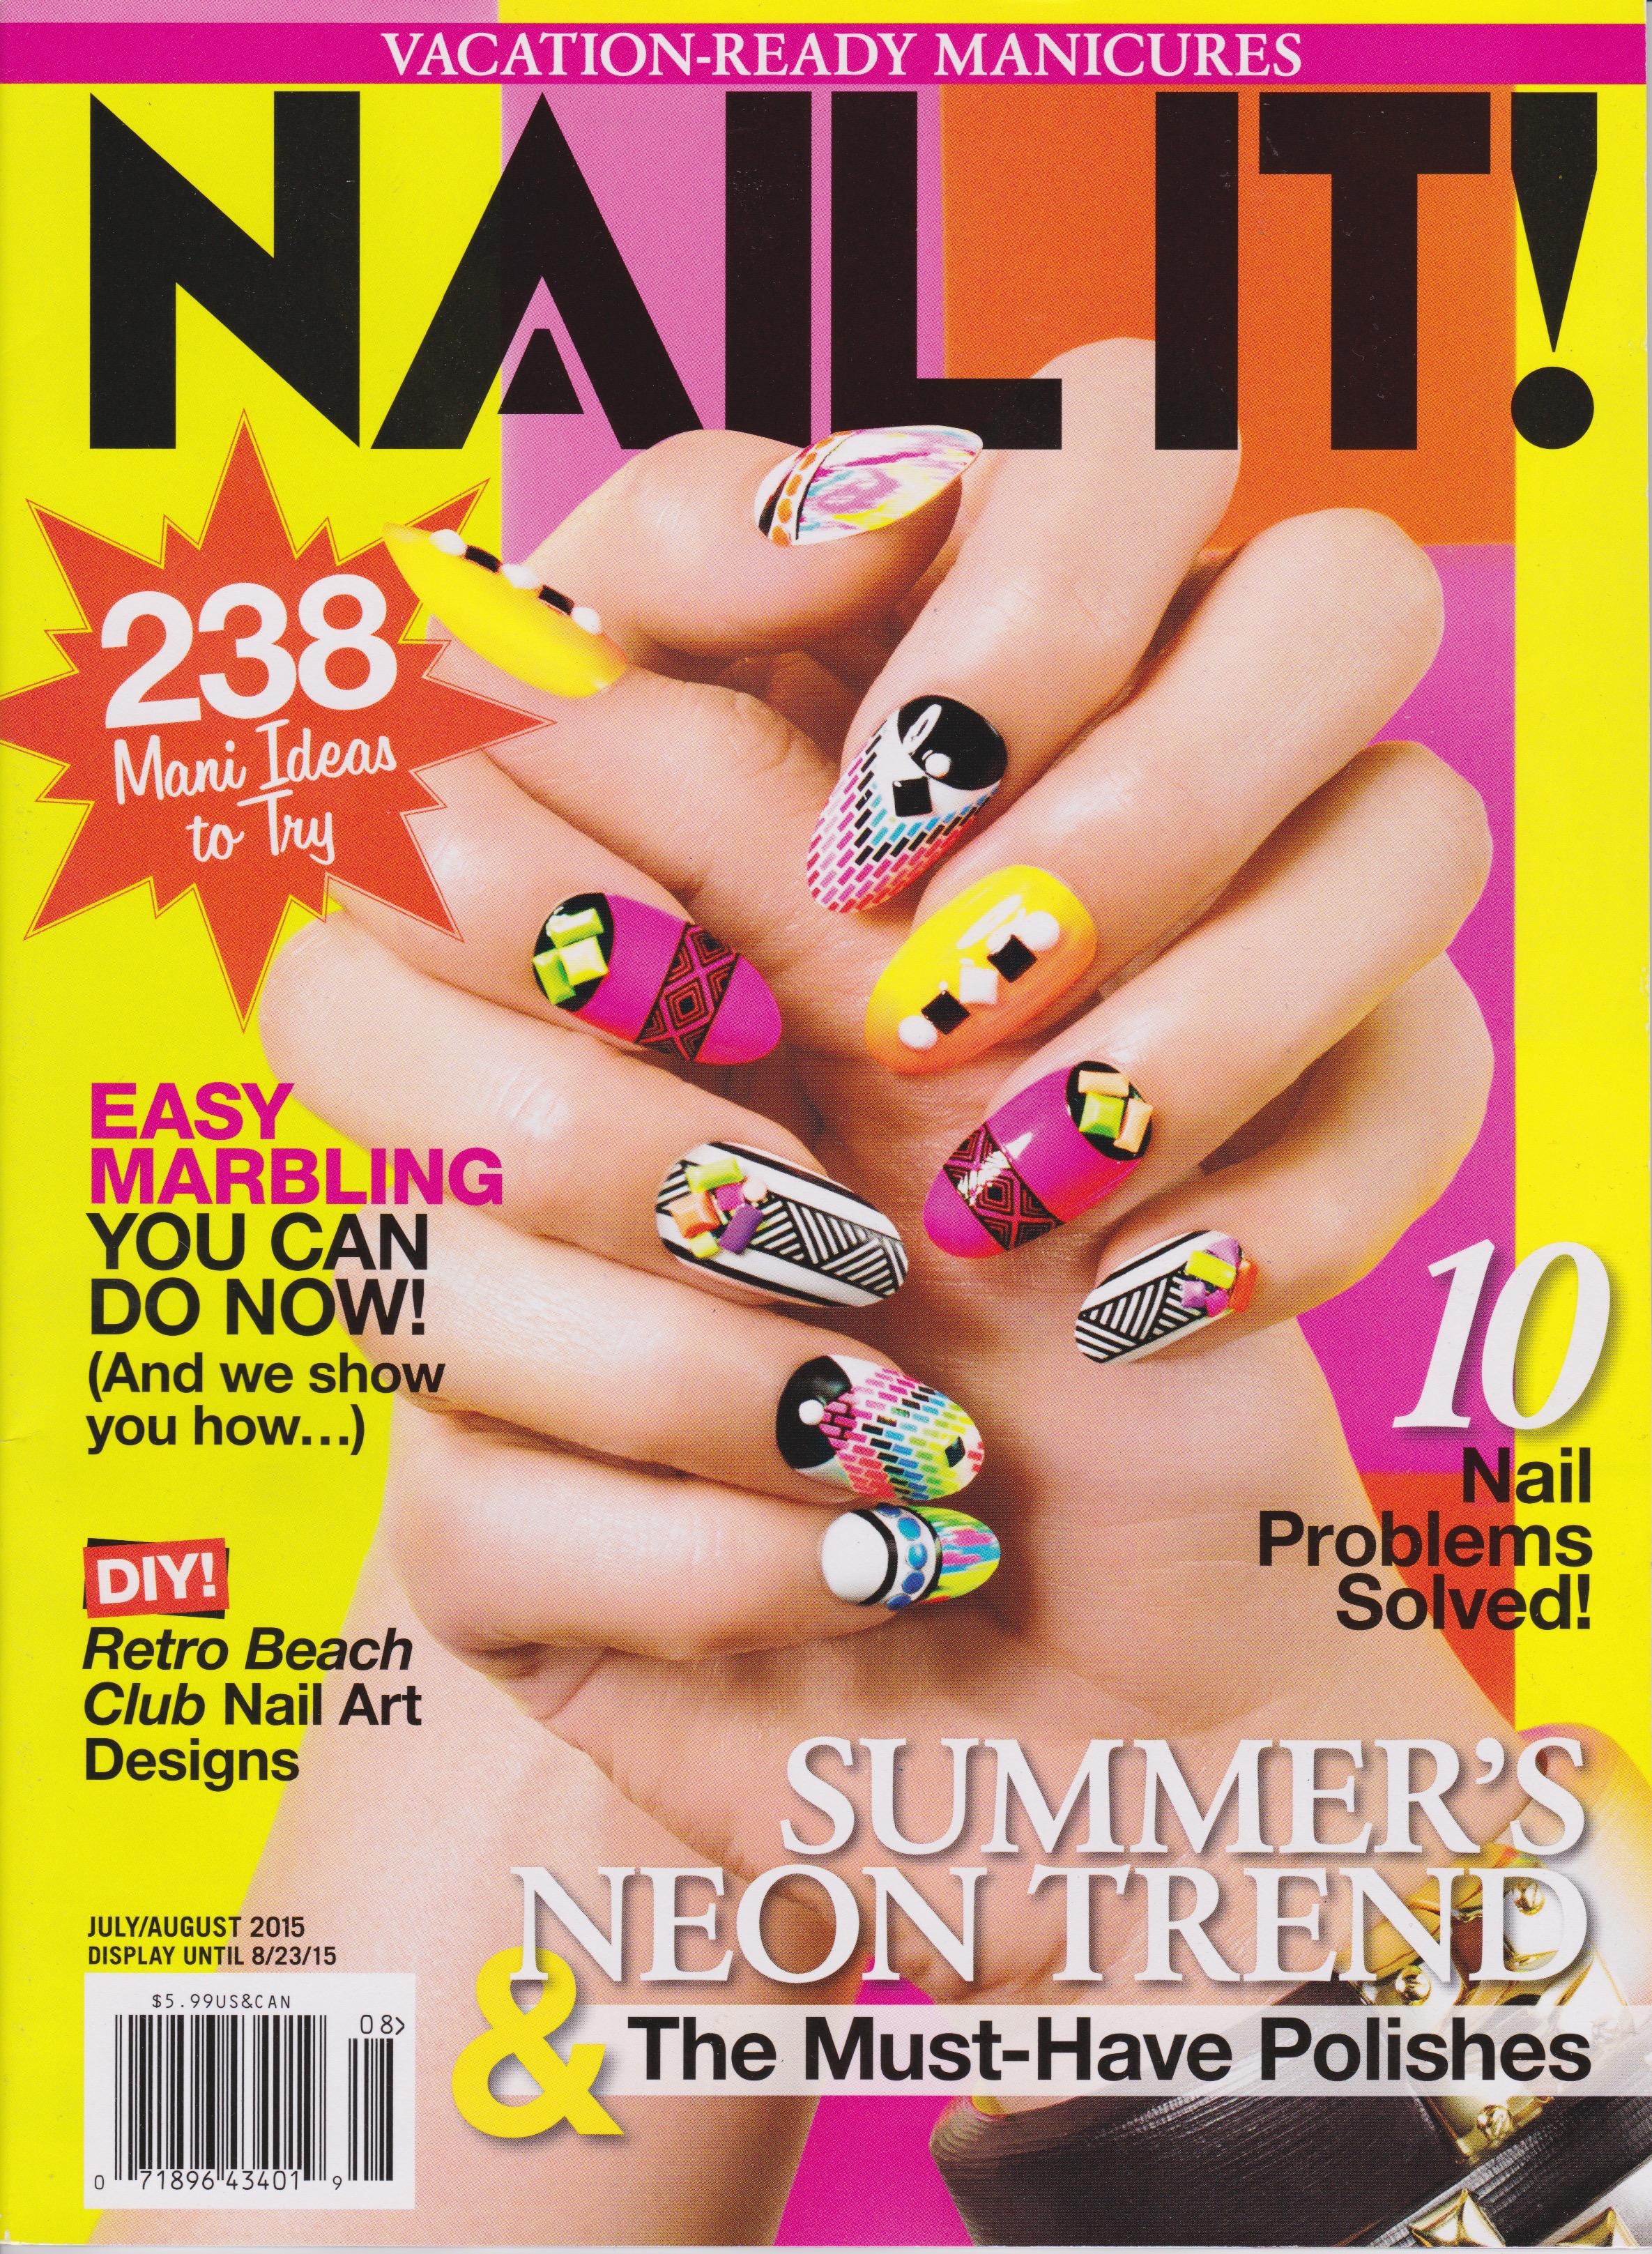 NAIL IT/July Aug 2015